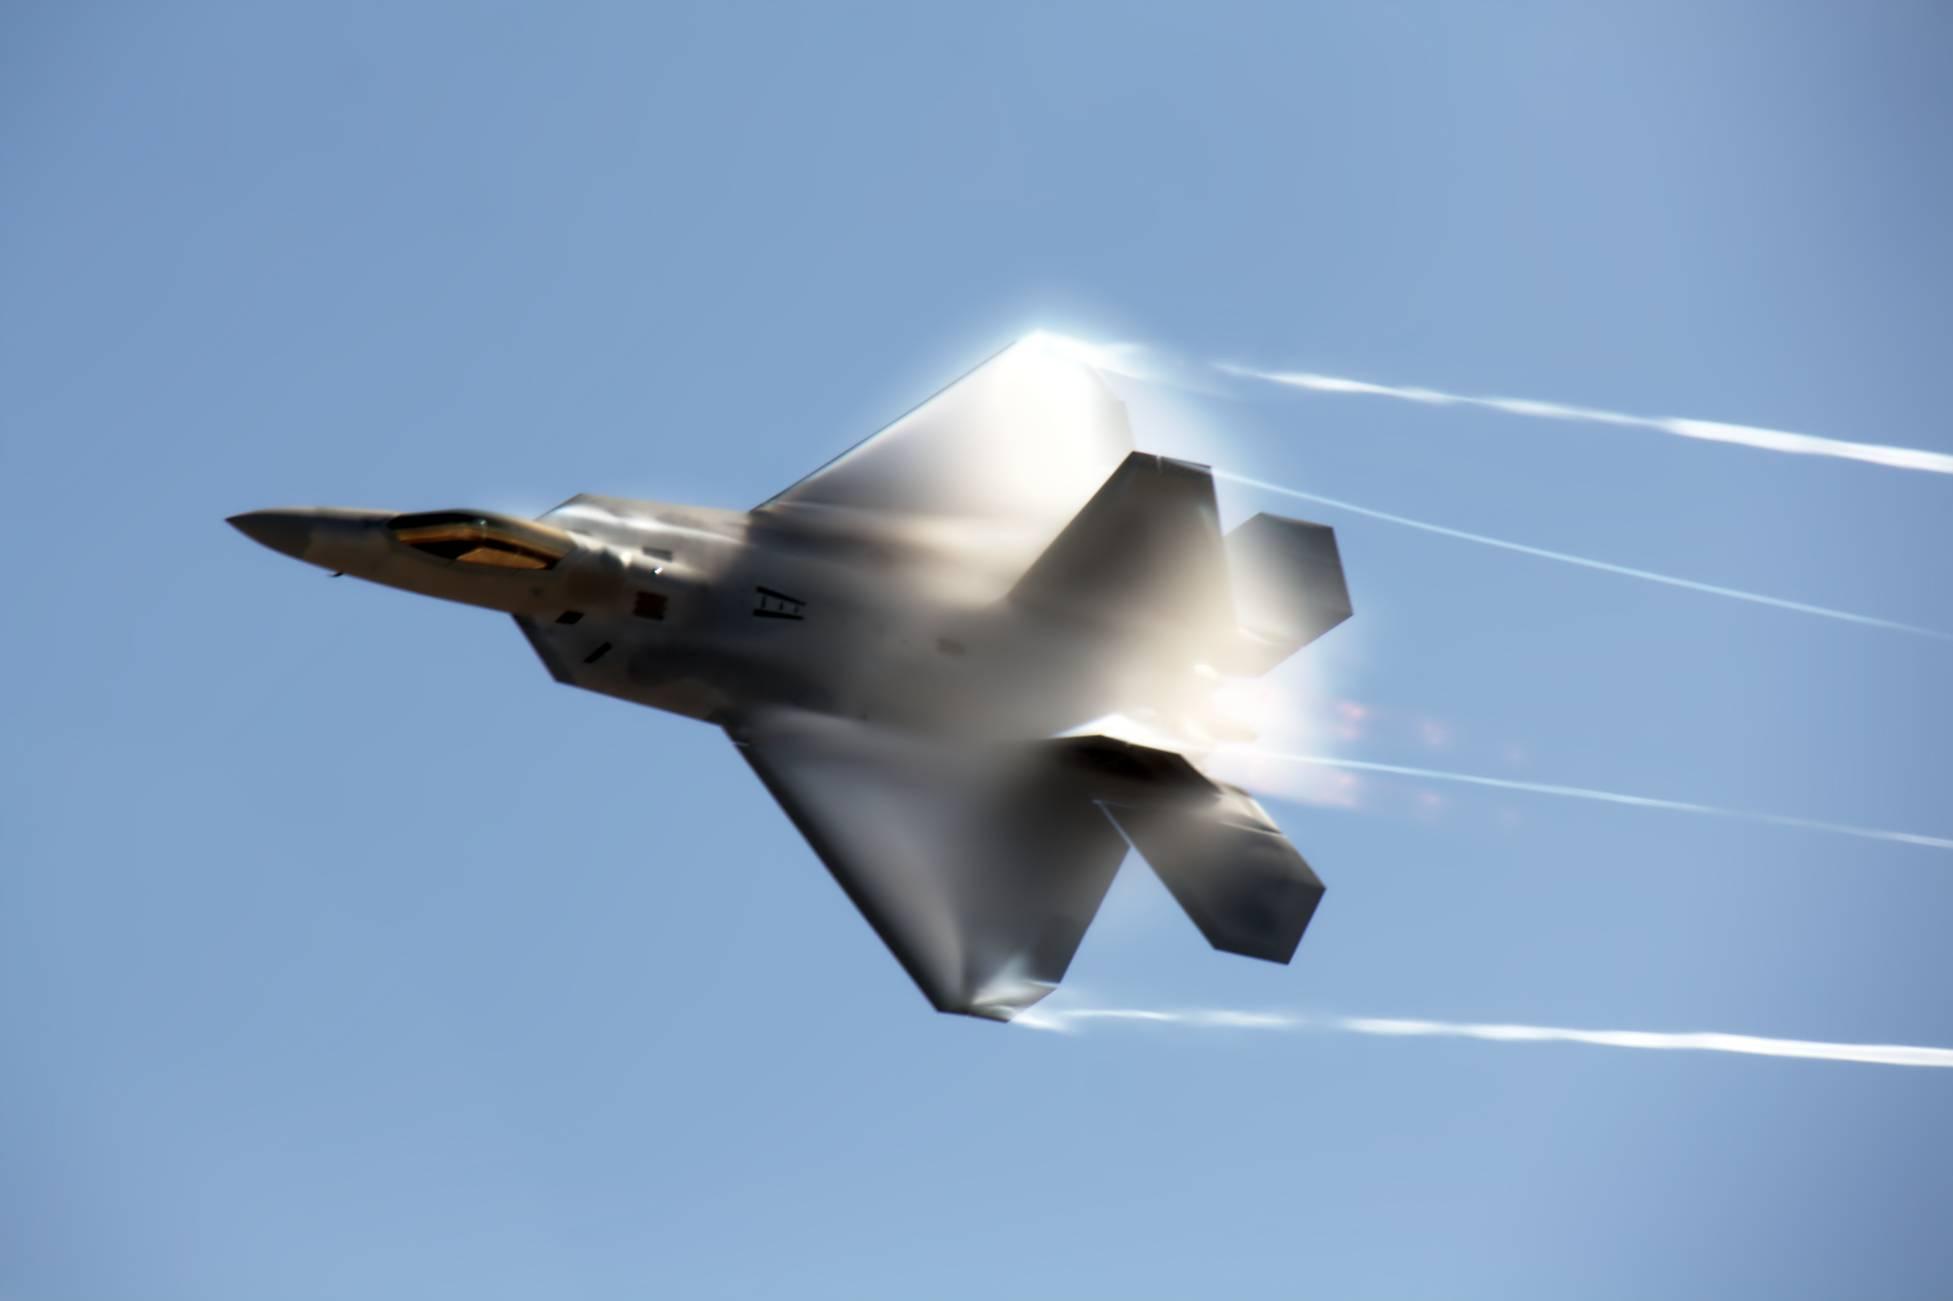 ���!�f_传说中的空中无敌猛禽-f-22隐形战斗机